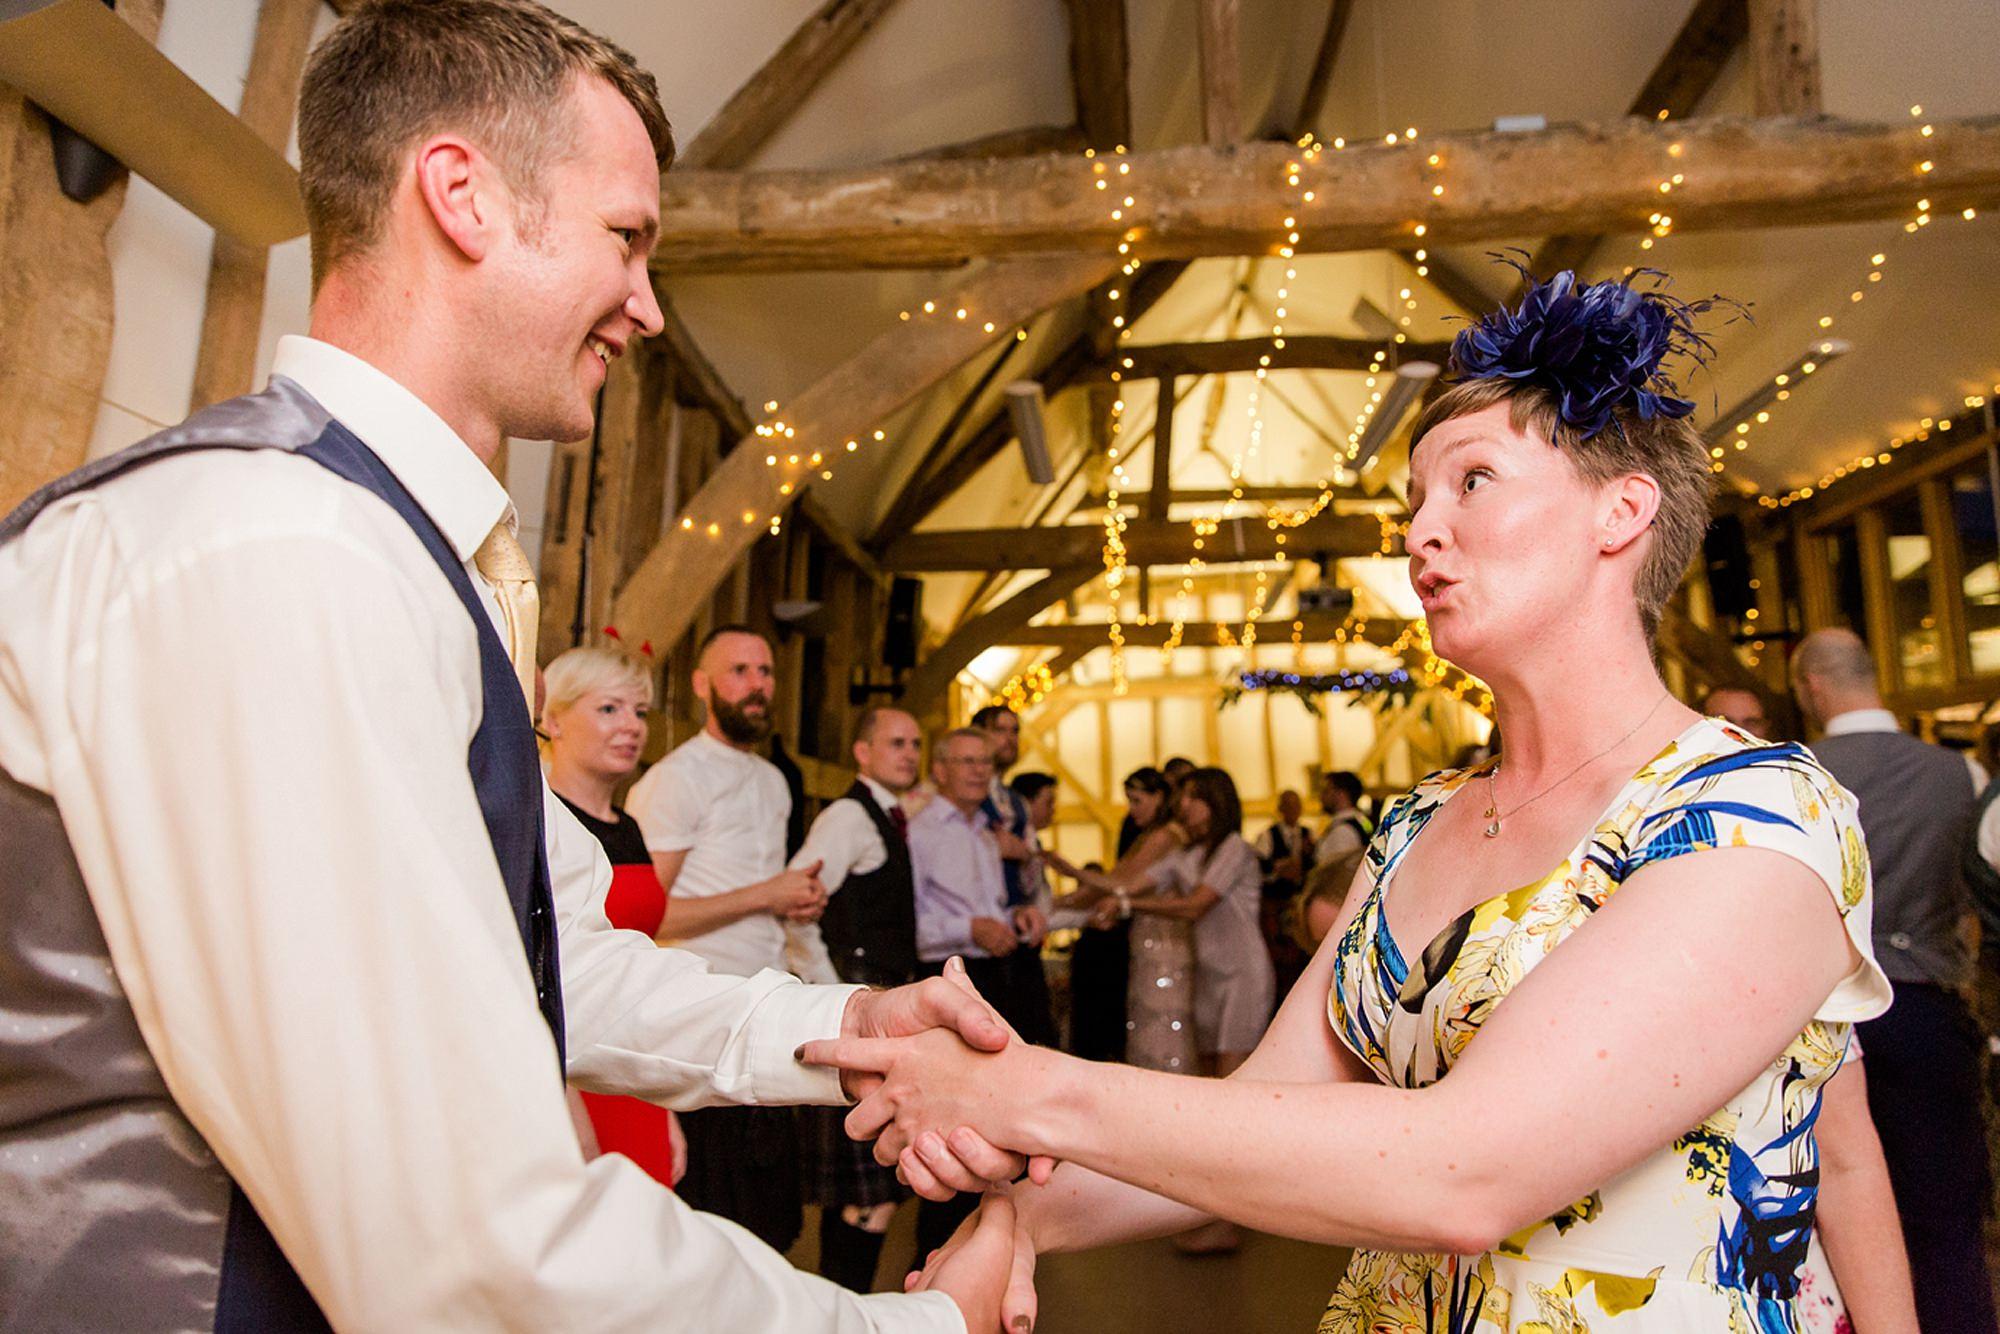 Outdoor humanist wedding photography guests dancing